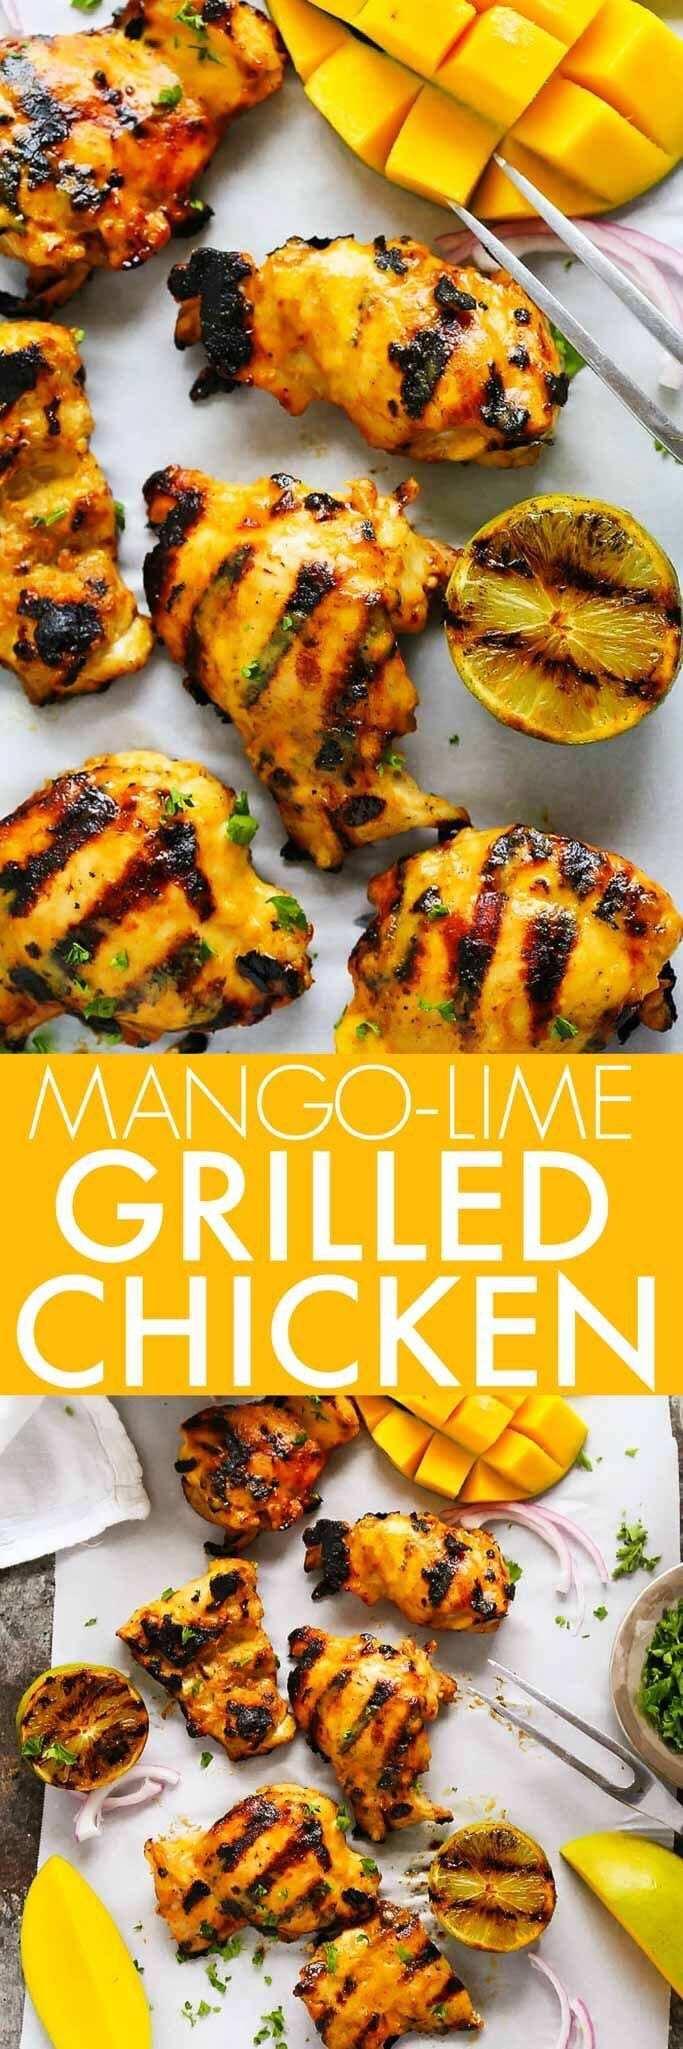 17. Mango-Lime Grilled Chicken